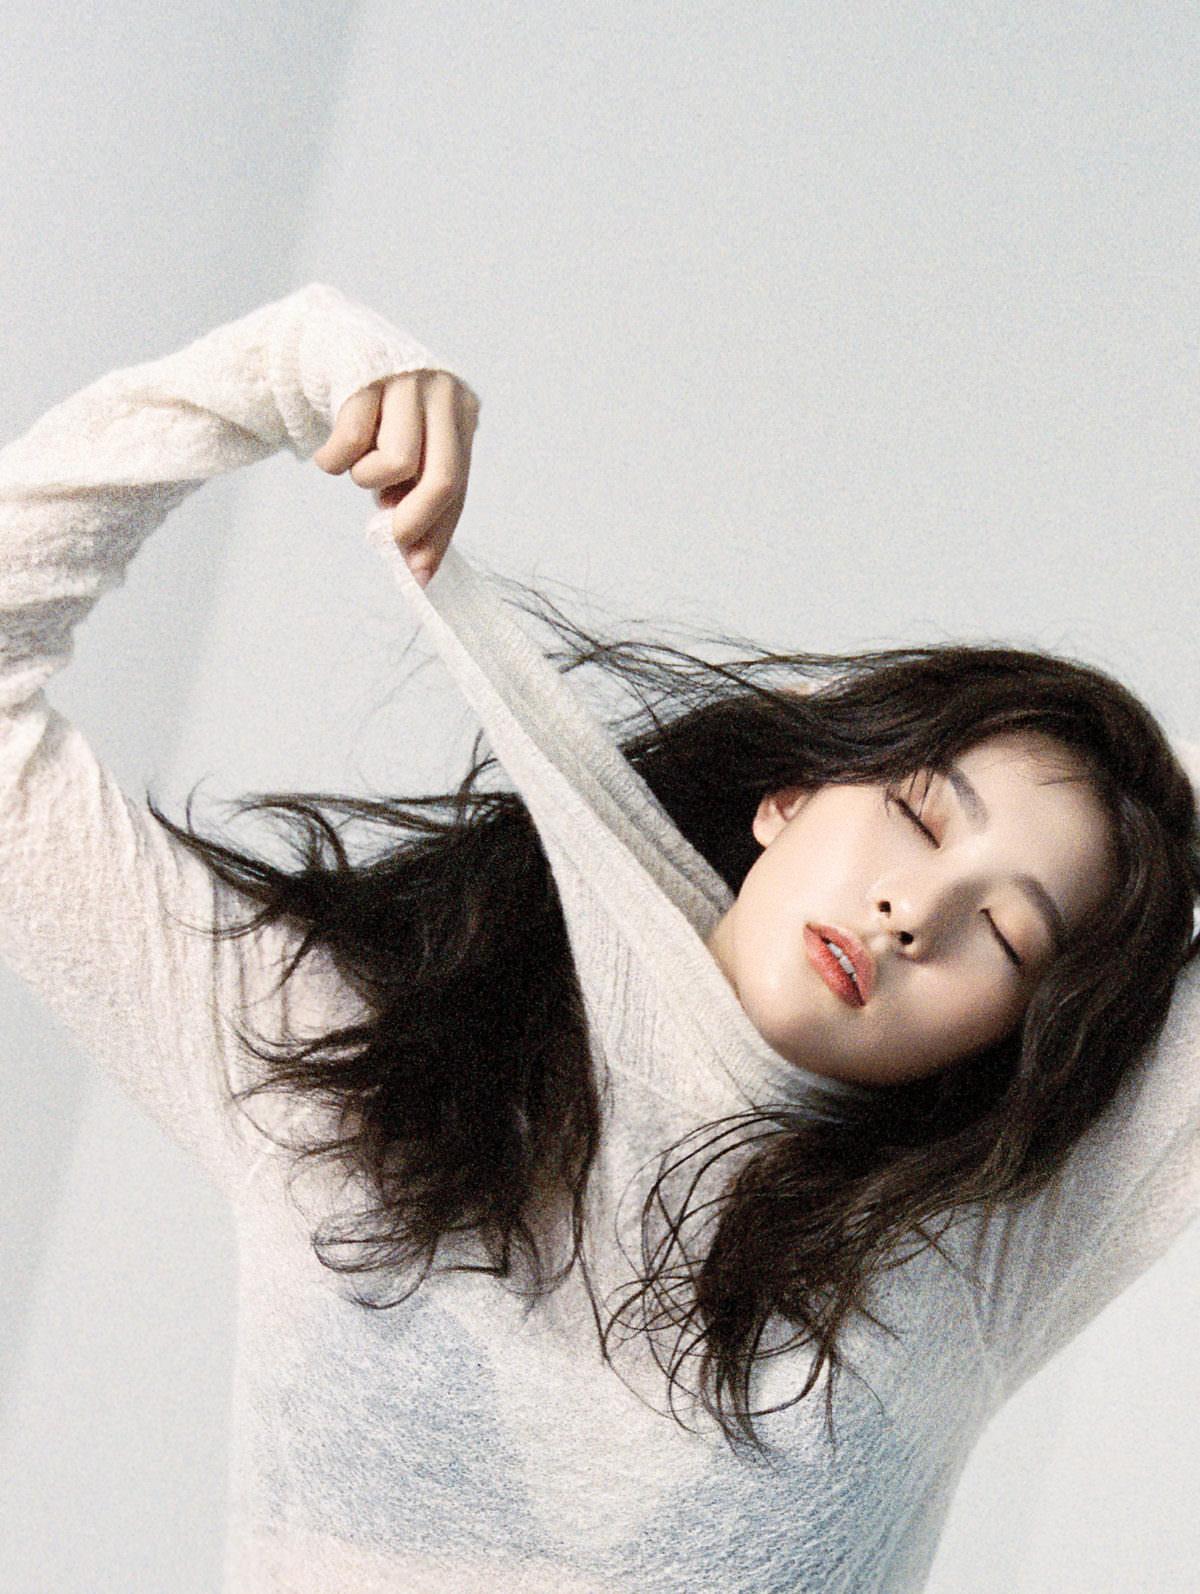 Red Velvet Seulgi Shocks Fans With Transparent Top! - Bias Wrecker